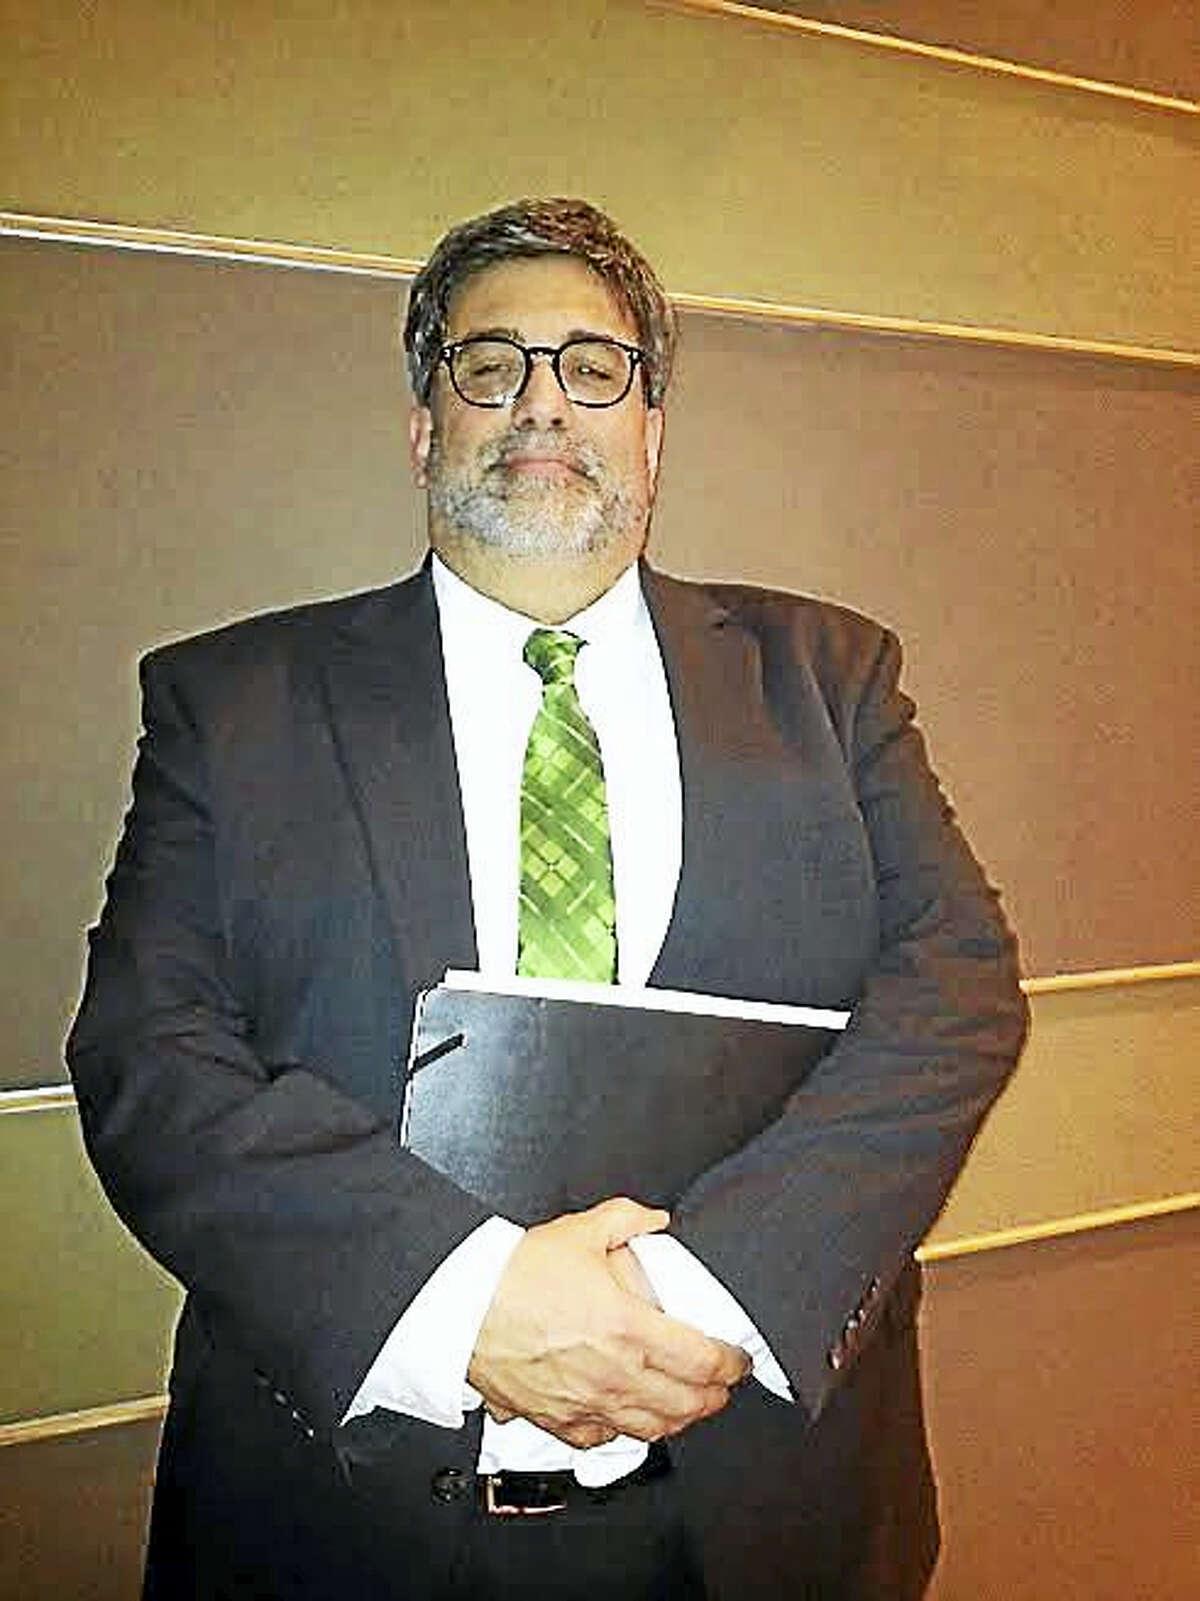 Rick Melita has been named Board of Alder liaison for Mayor Toni Harp.